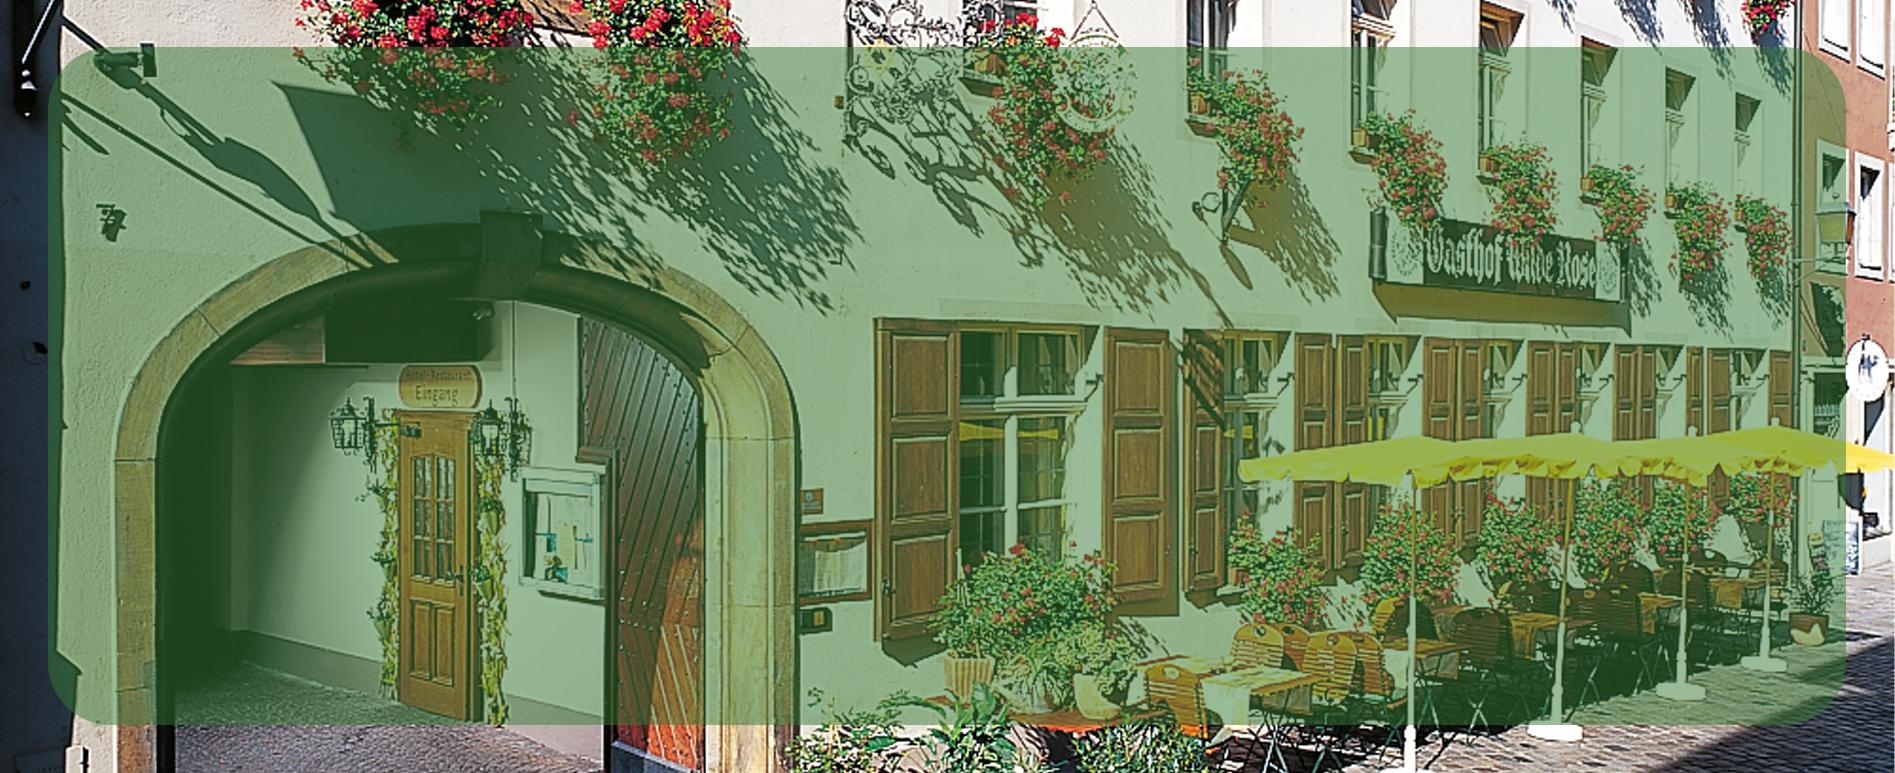 Hotel-Wilde-Rose-Bamberg-Kesslerstrasse-Aussenansicht-Startslider